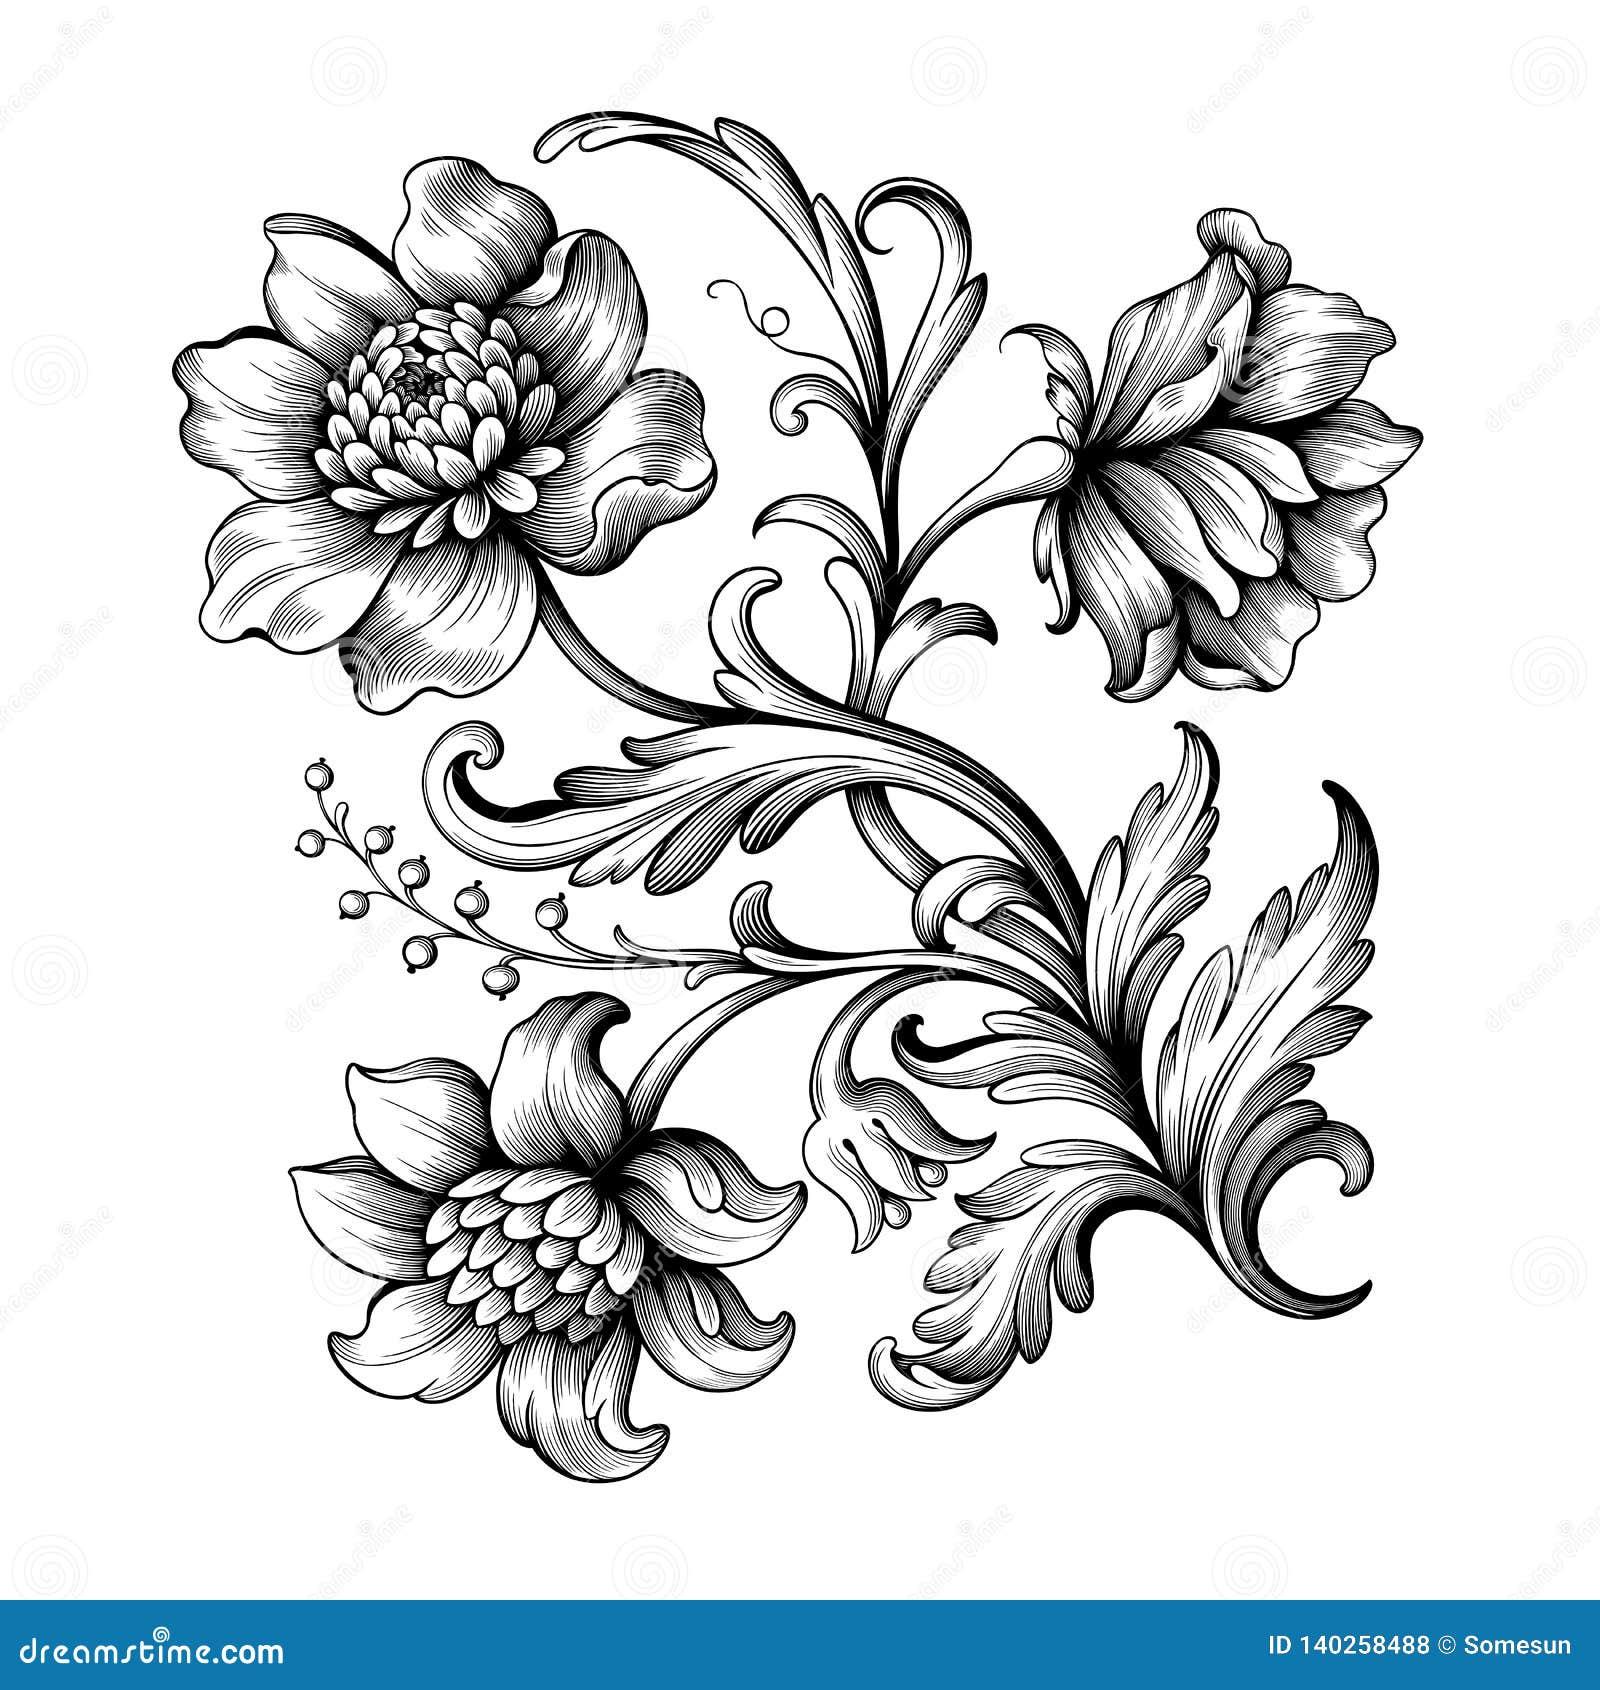 Flower vintage Baroque scroll Victorian frame border floral ornament engraved retro pattern rose peony tattoo filigree vector